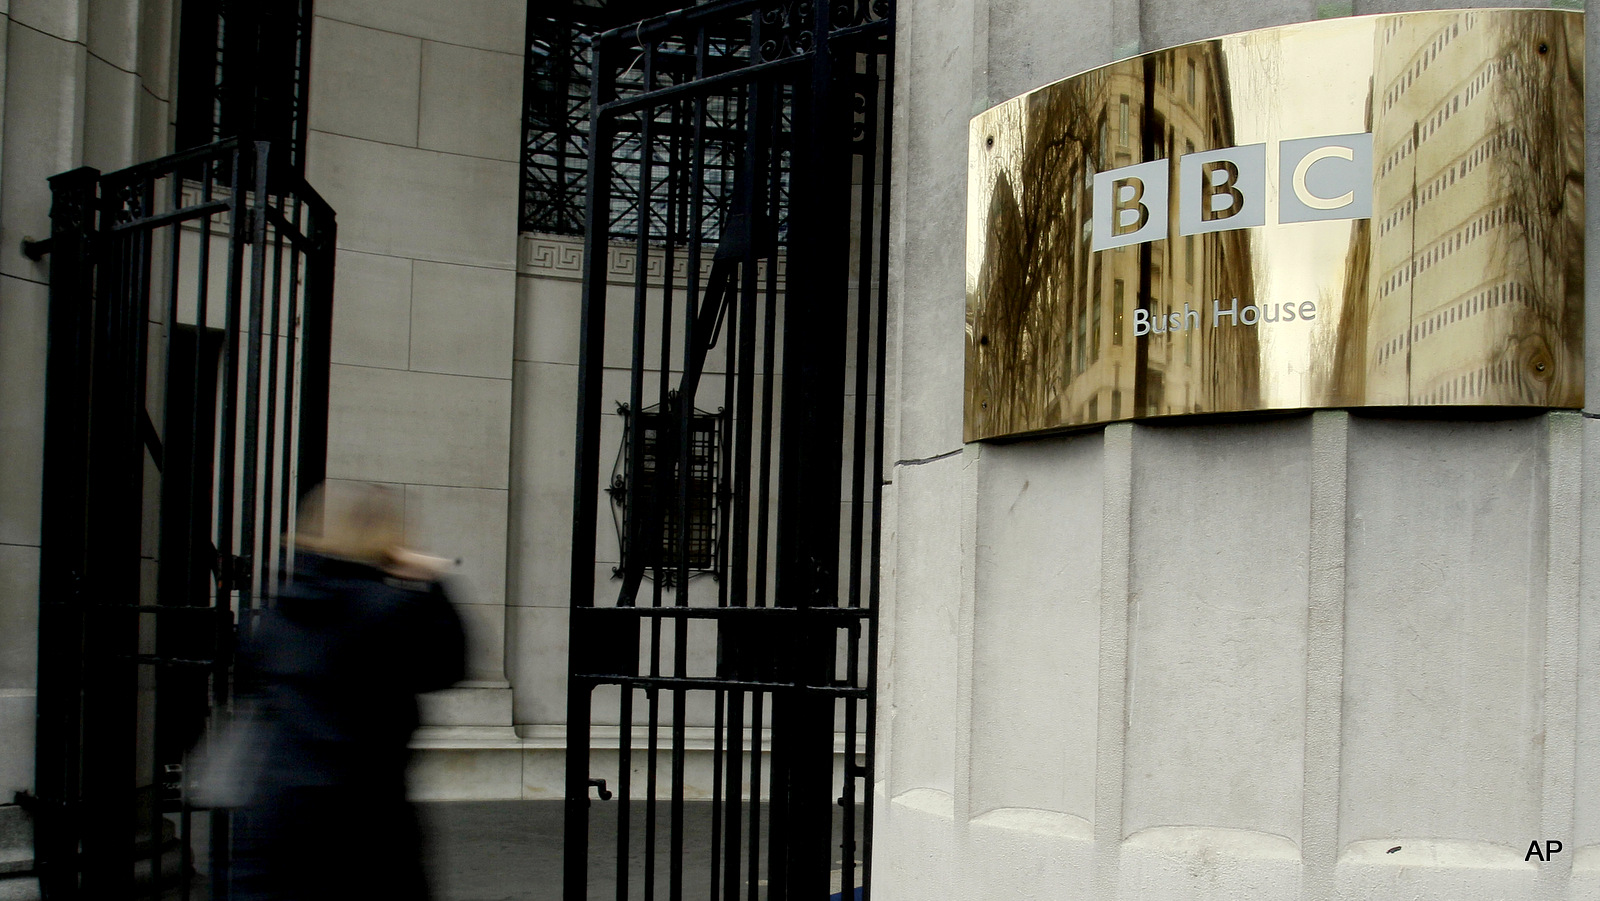 A pedestrian enters the BBC's Bush House in London.